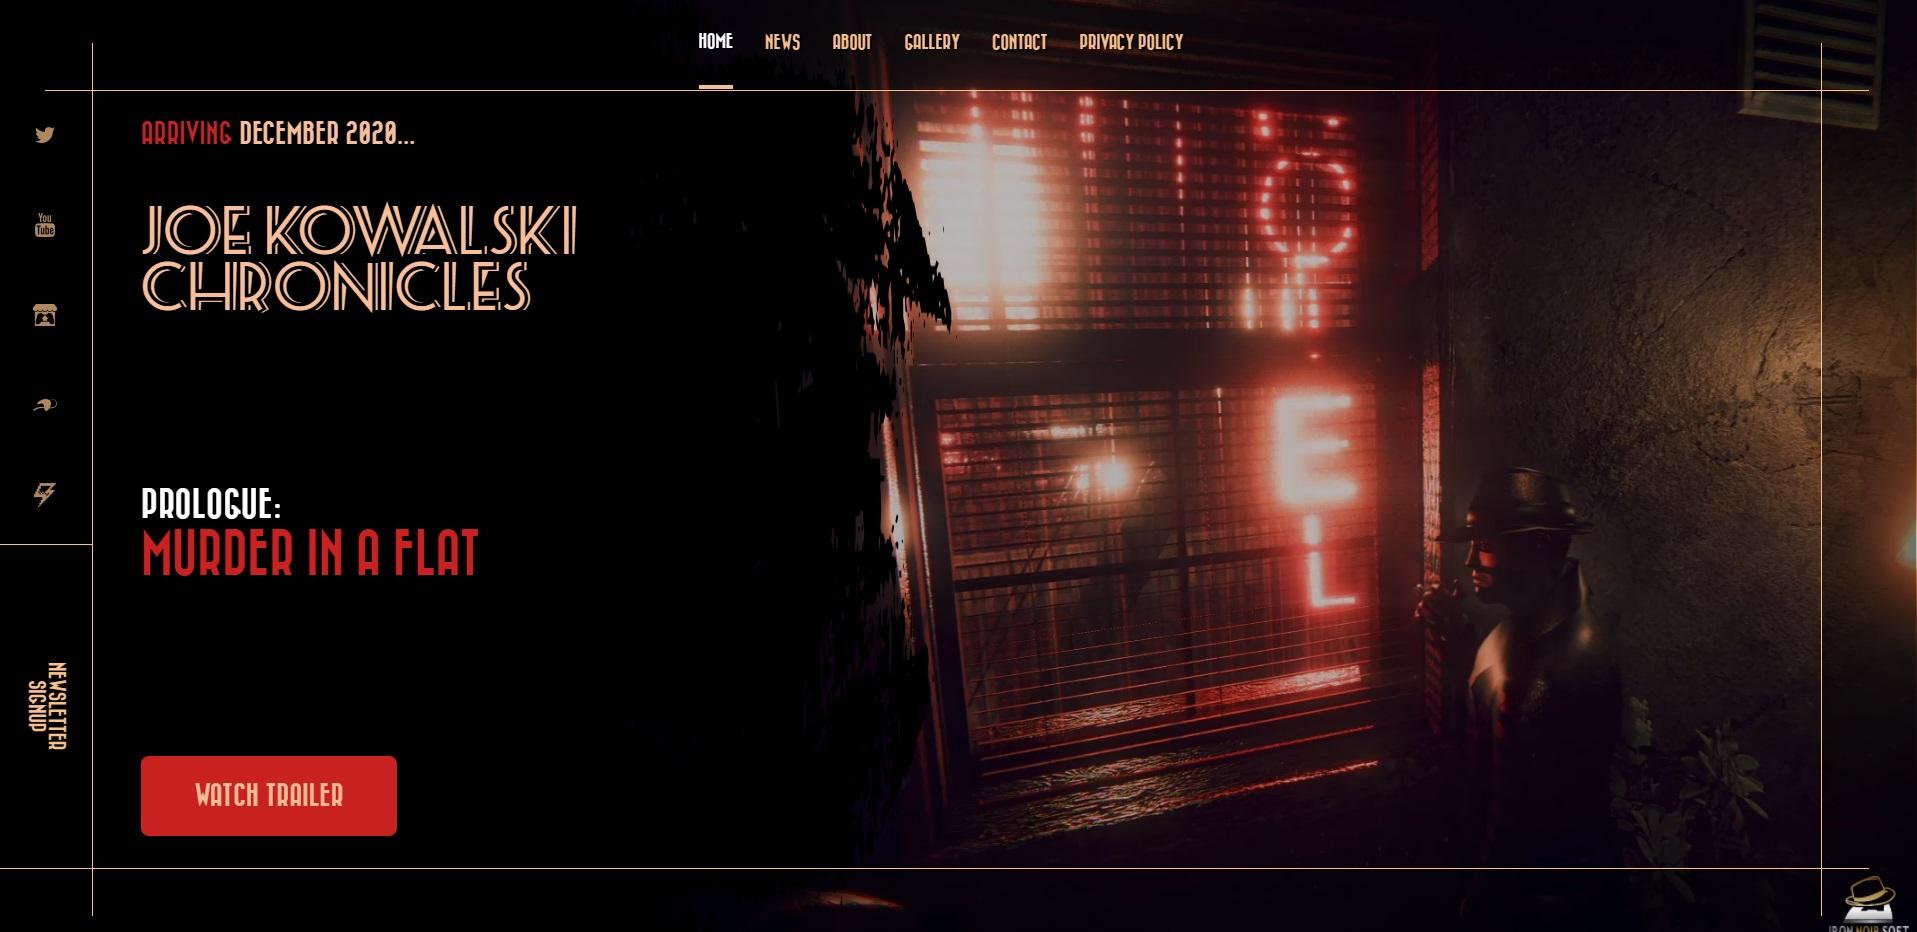 Joe Kowalski Chronicles Official Website